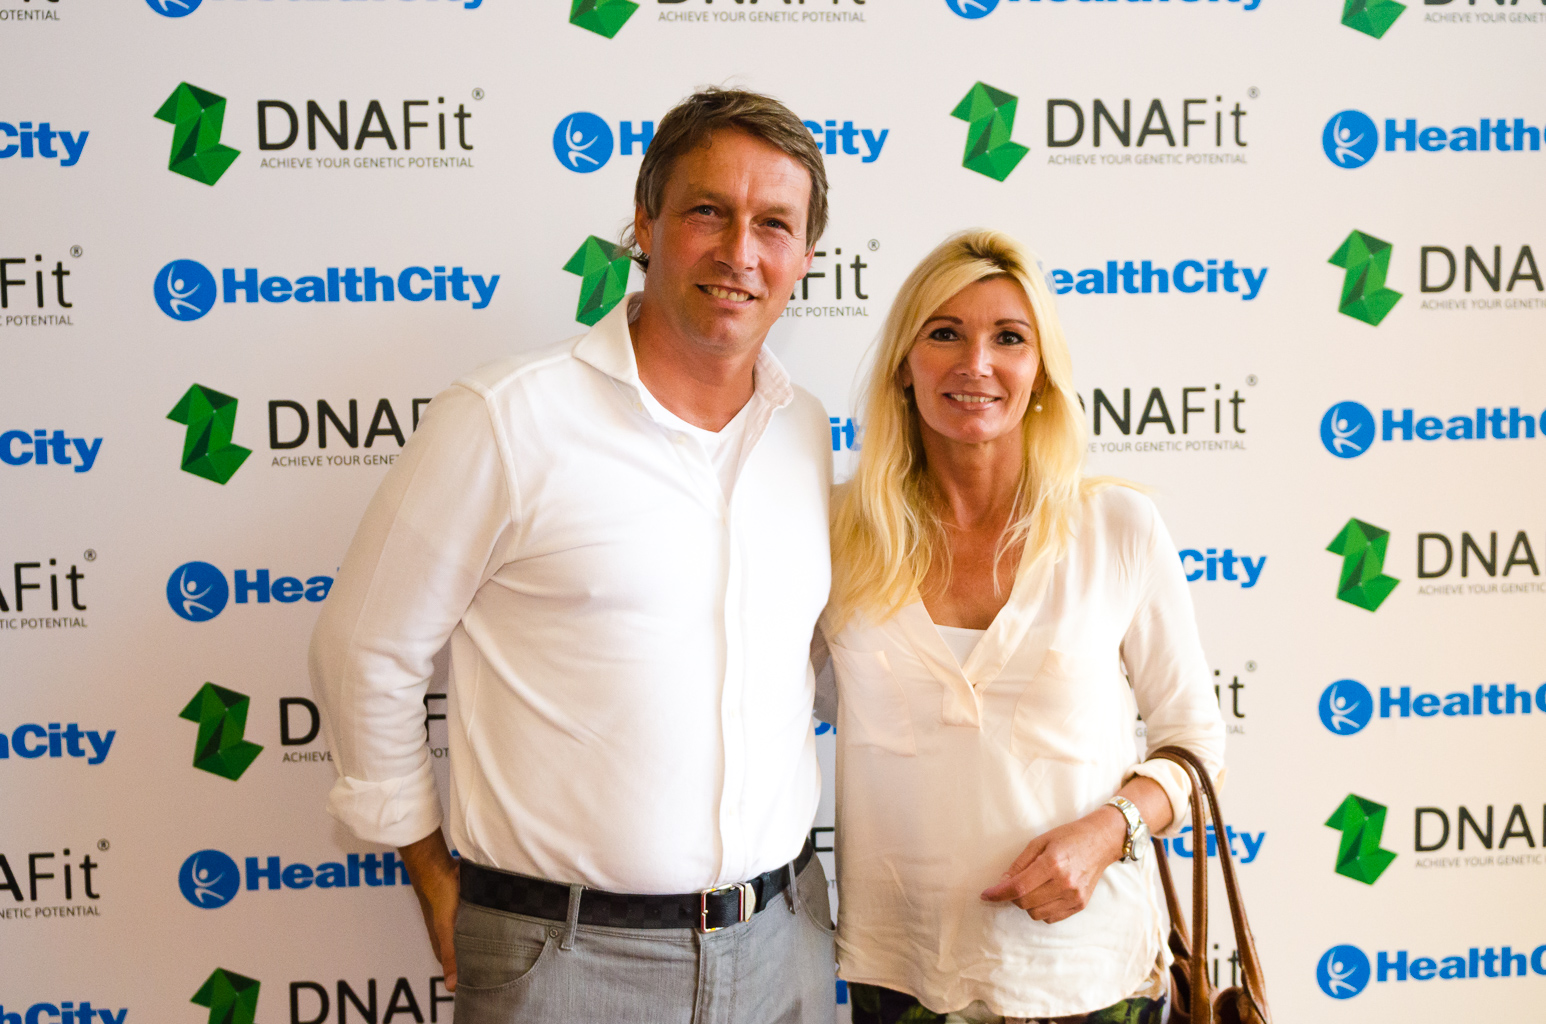 20140917 Healthcity DNAFit-004